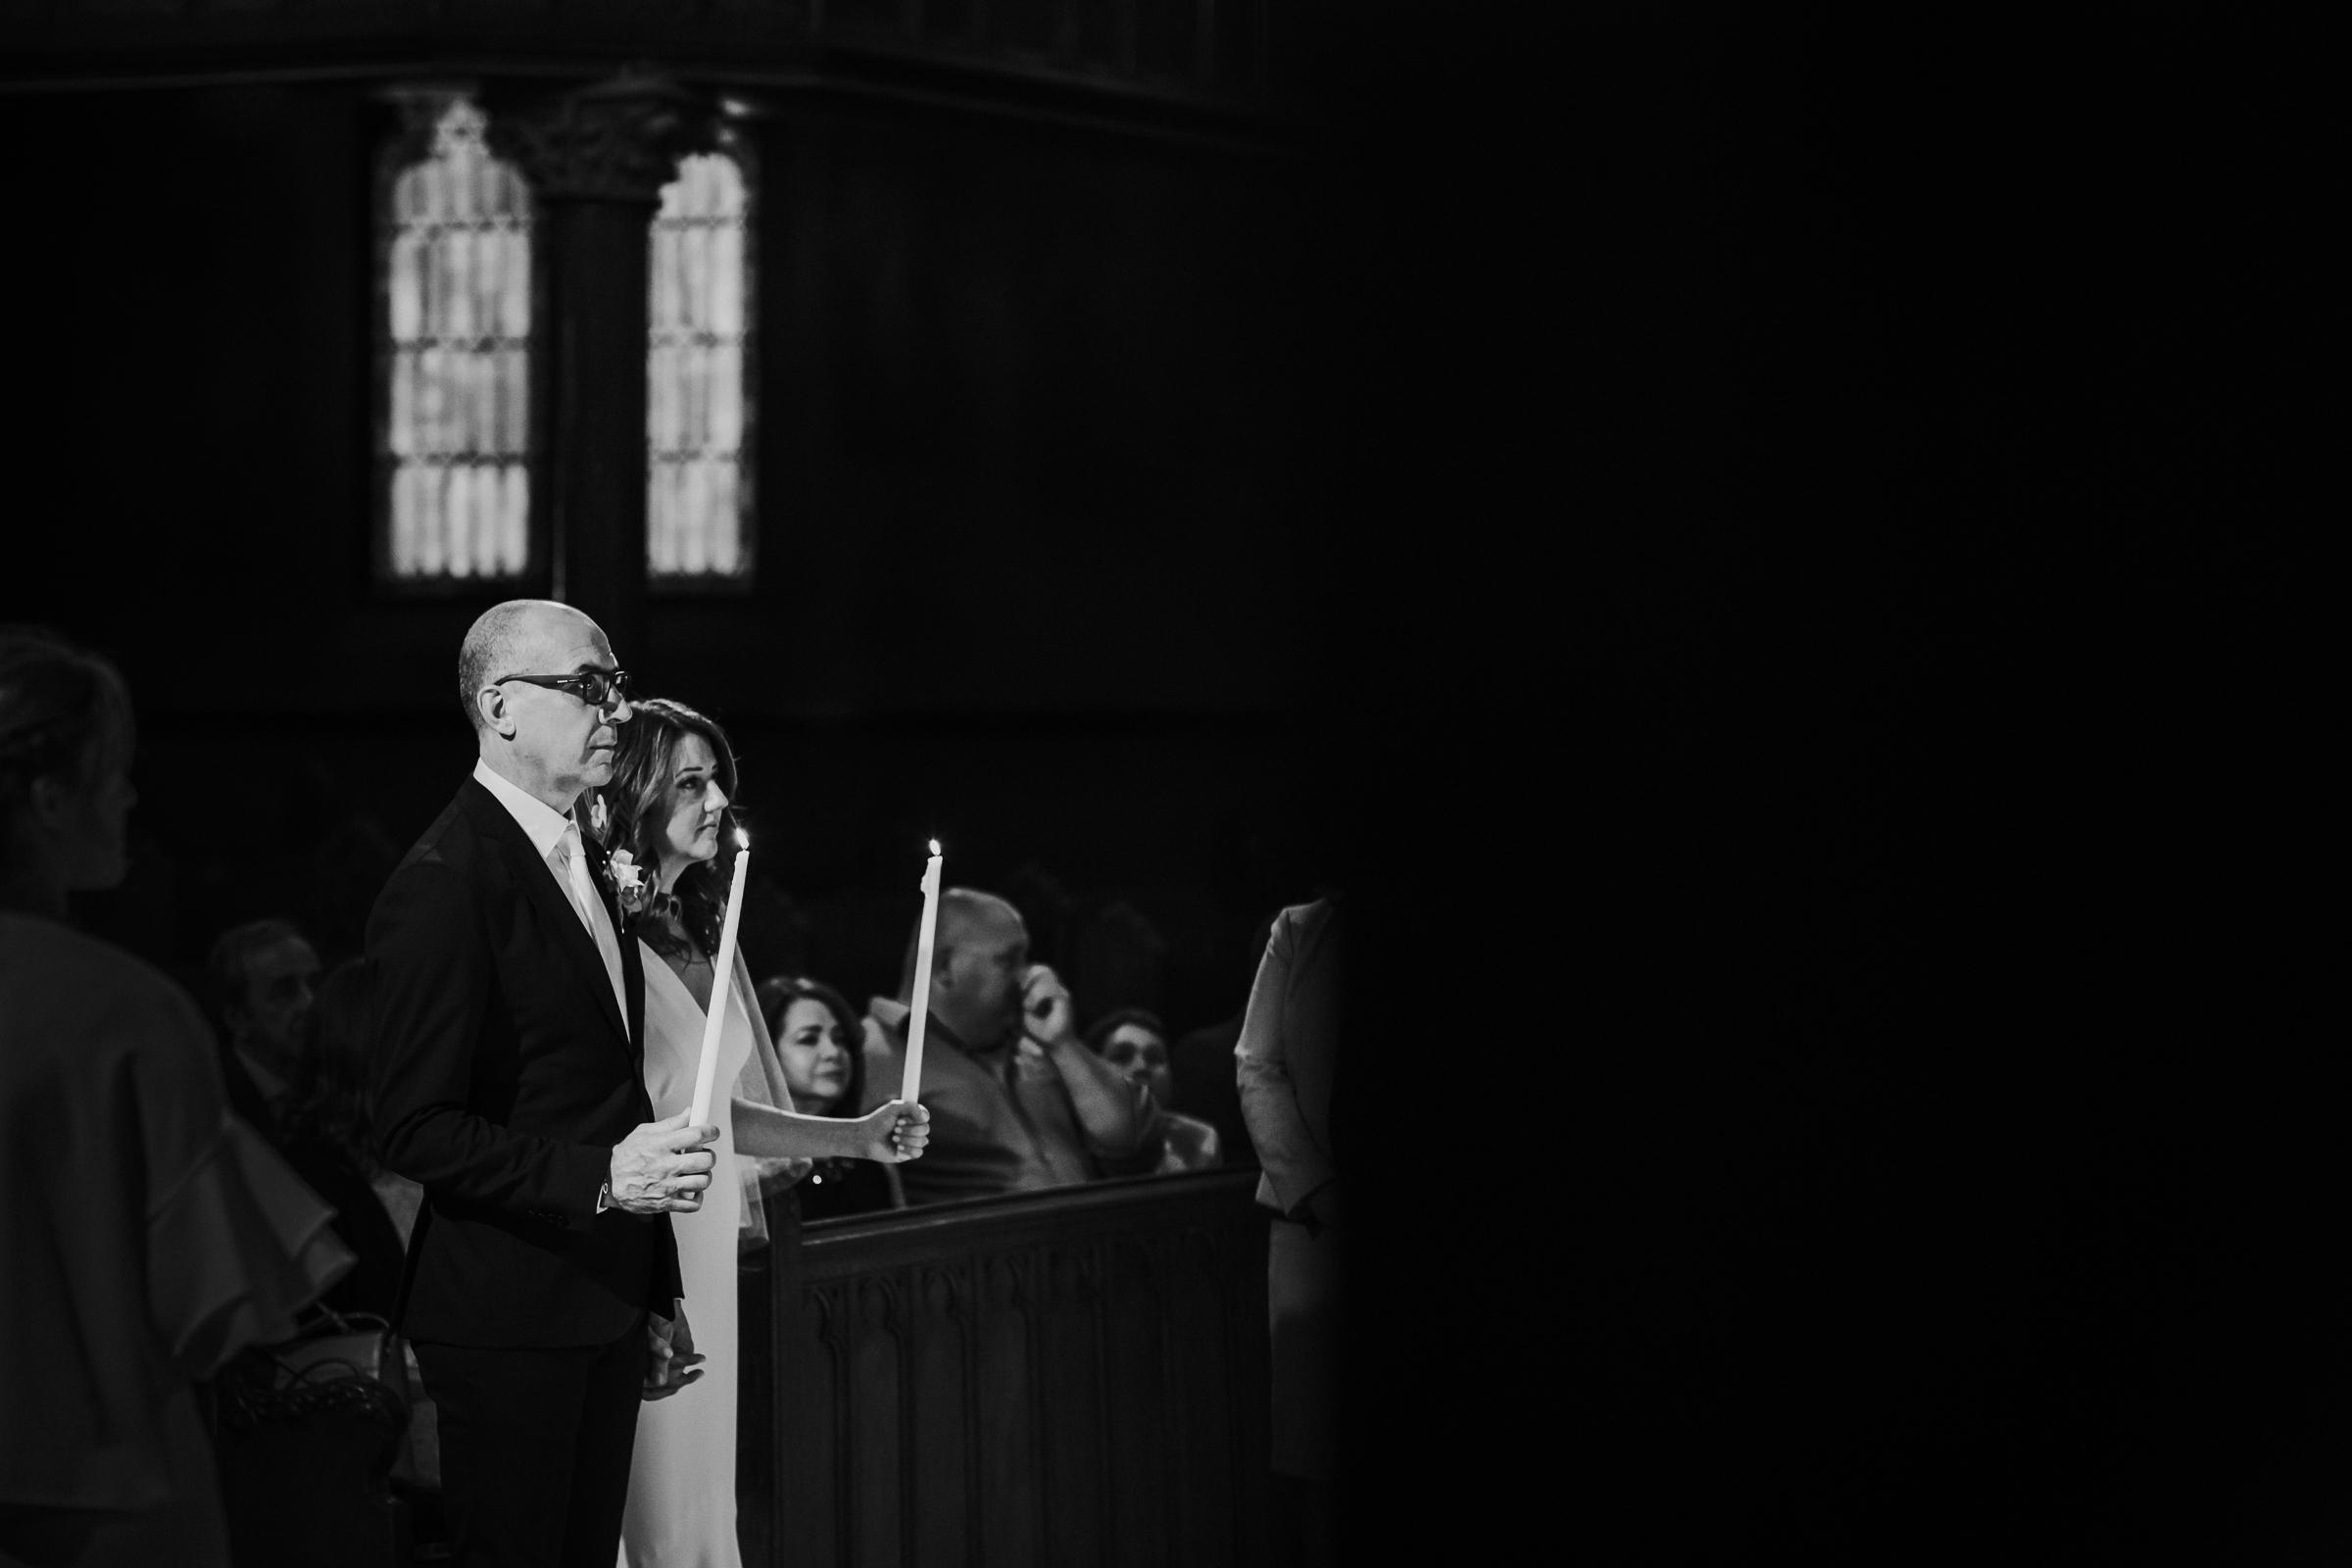 New-York-Documentary-Wedding-Photography-Best-Of-2017-by-Elvira-Kalviste-Photography-18.jpg